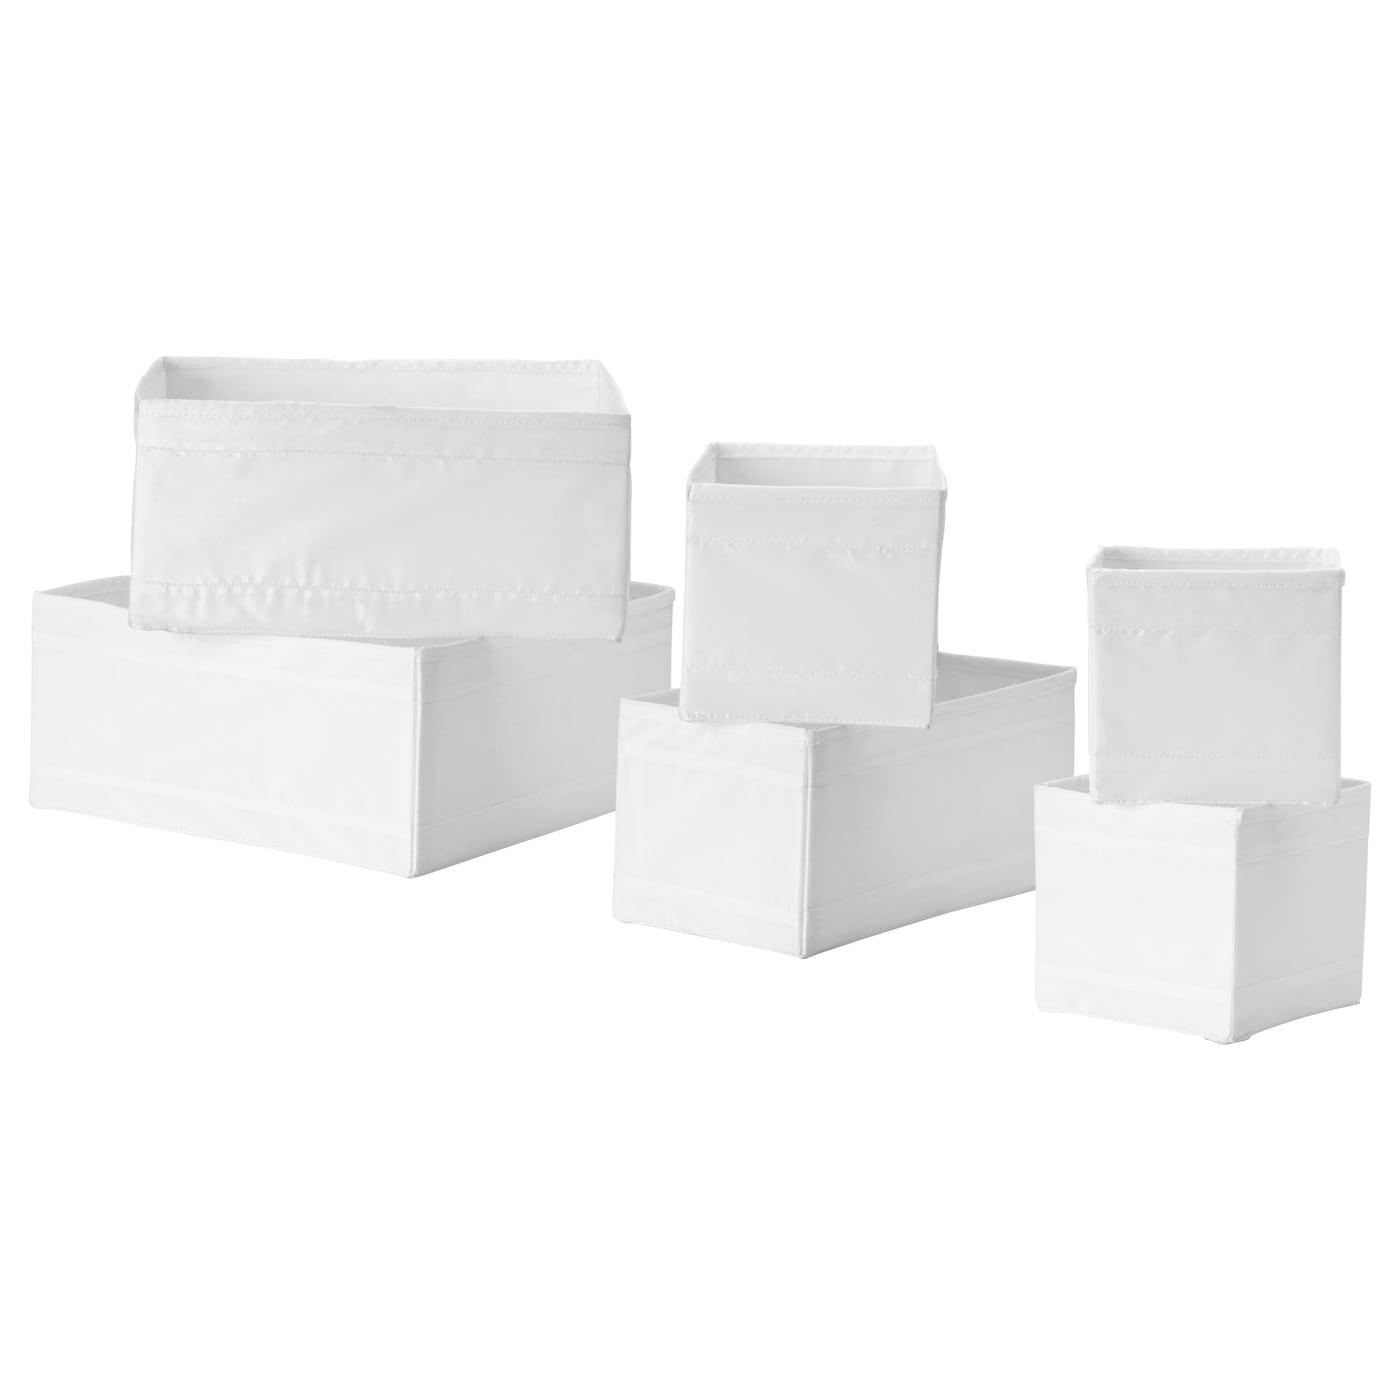 skubb box set of 6 white ikea. Black Bedroom Furniture Sets. Home Design Ideas